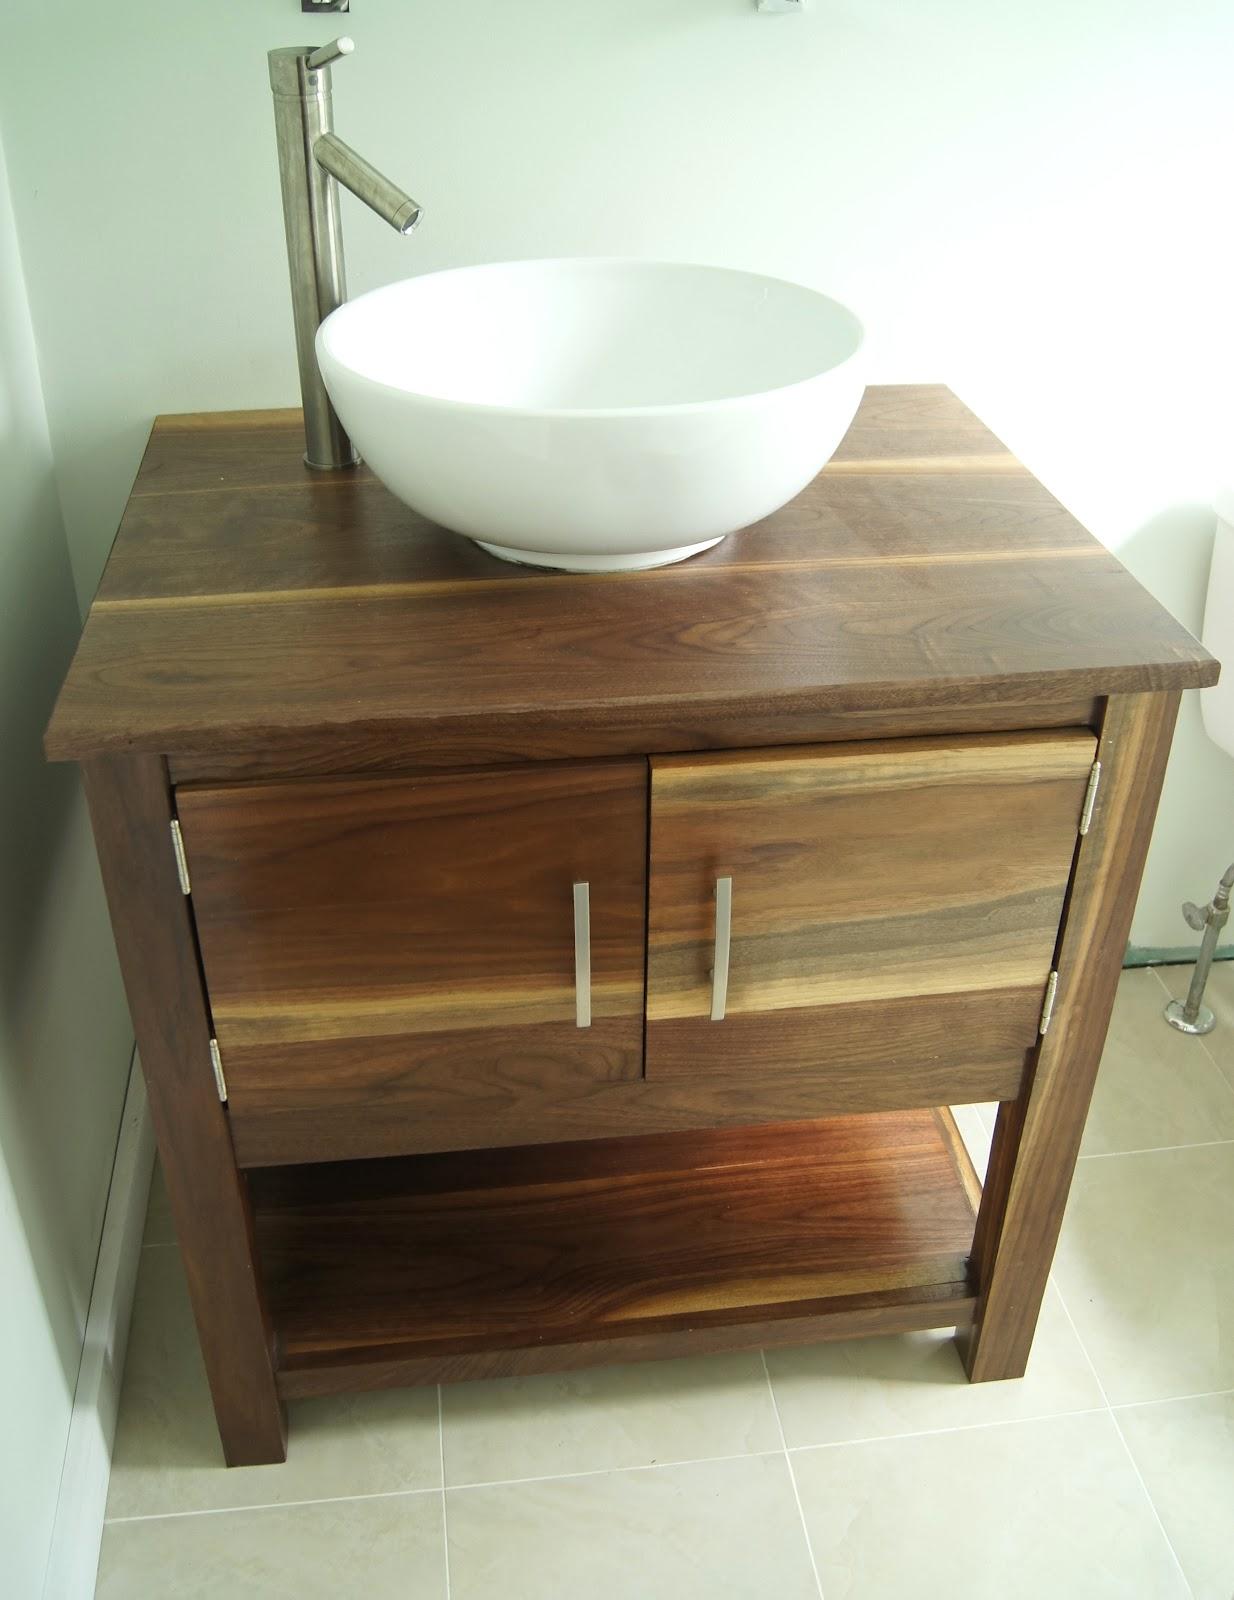 Wightman Specialty Woods DIY Bathroom Vanity